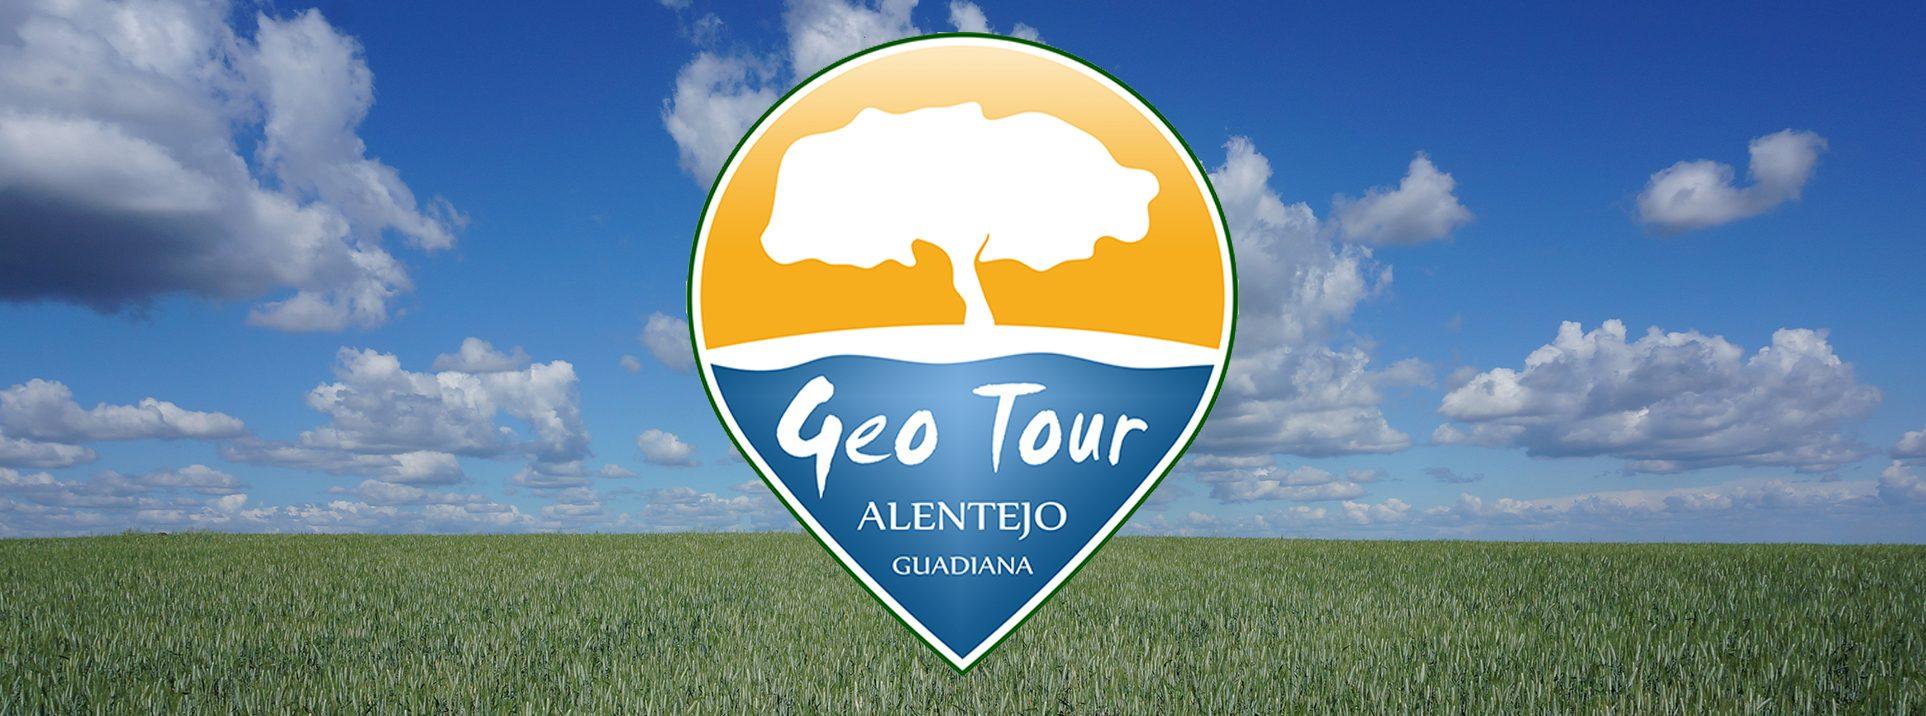 Alentejo GeoTour (Guadiana)